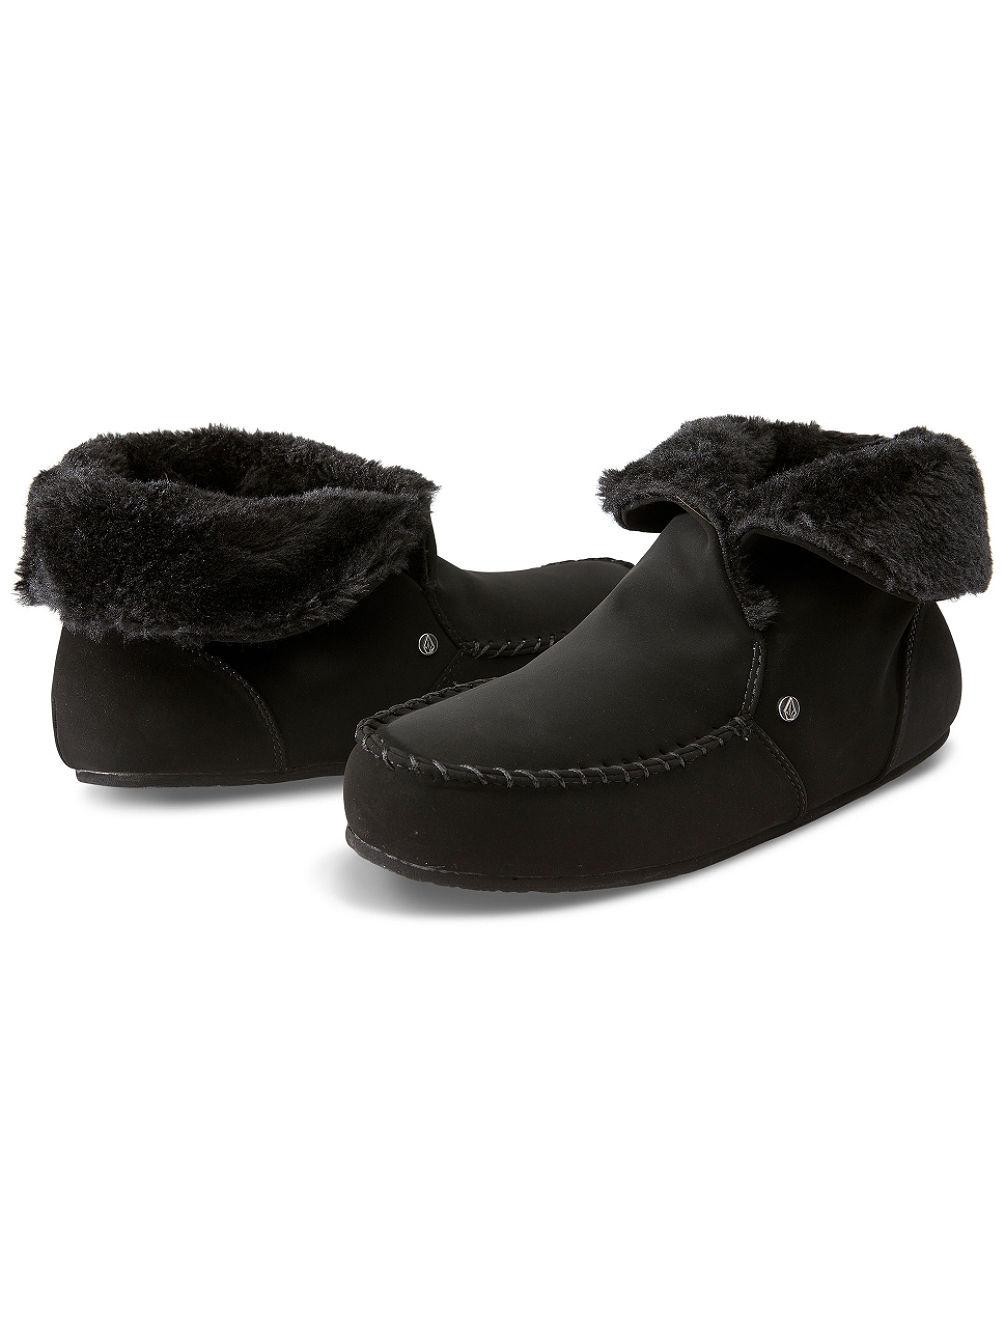 good-spirits-slippers-women